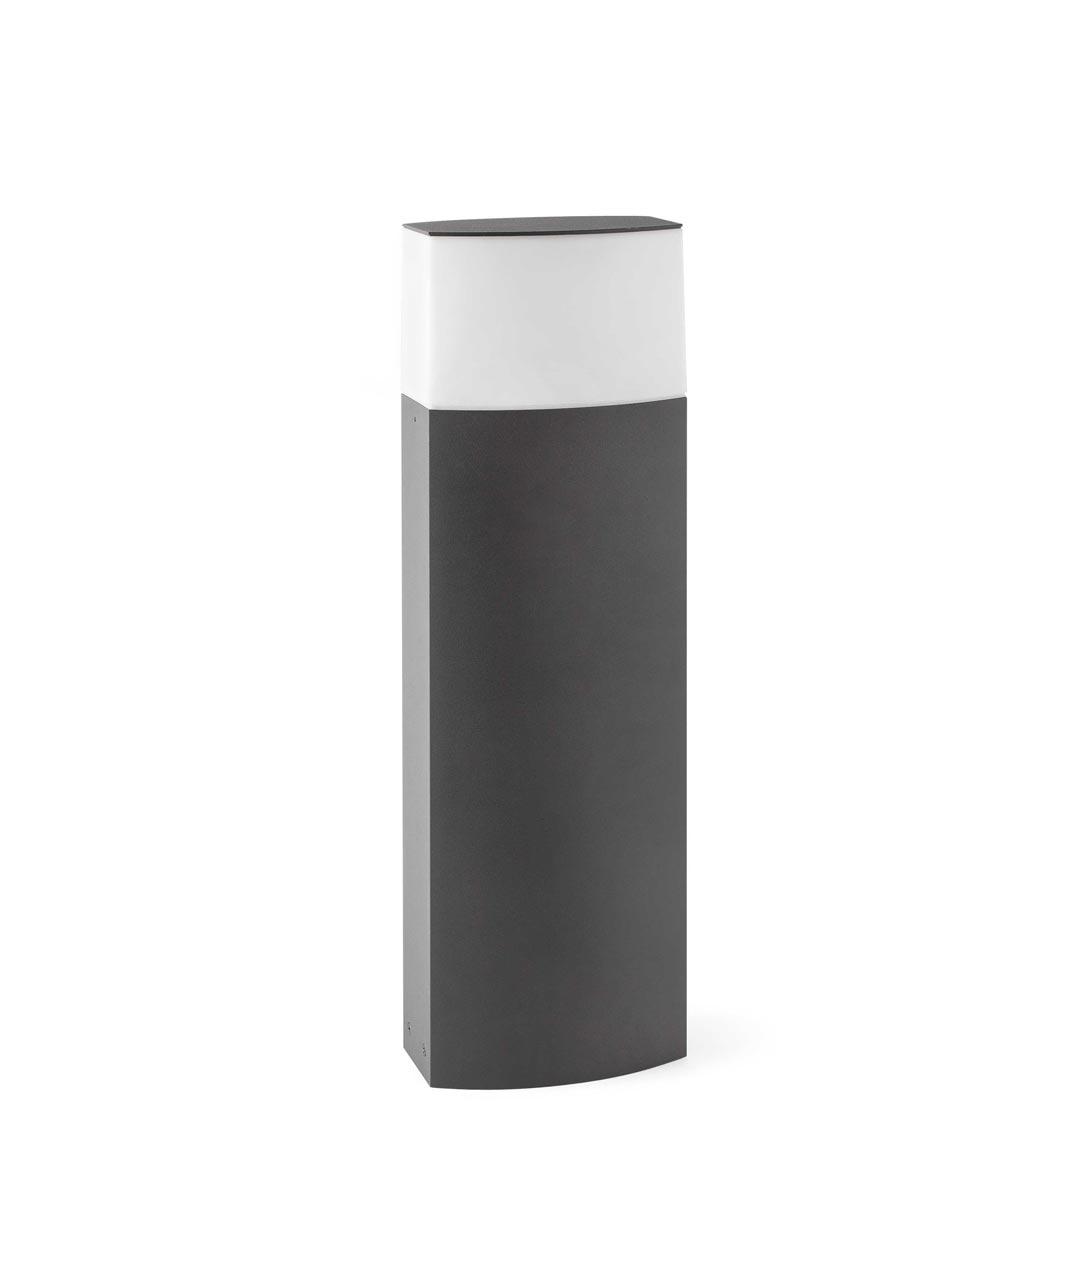 Baliza 60 cm DATNA gris oscura